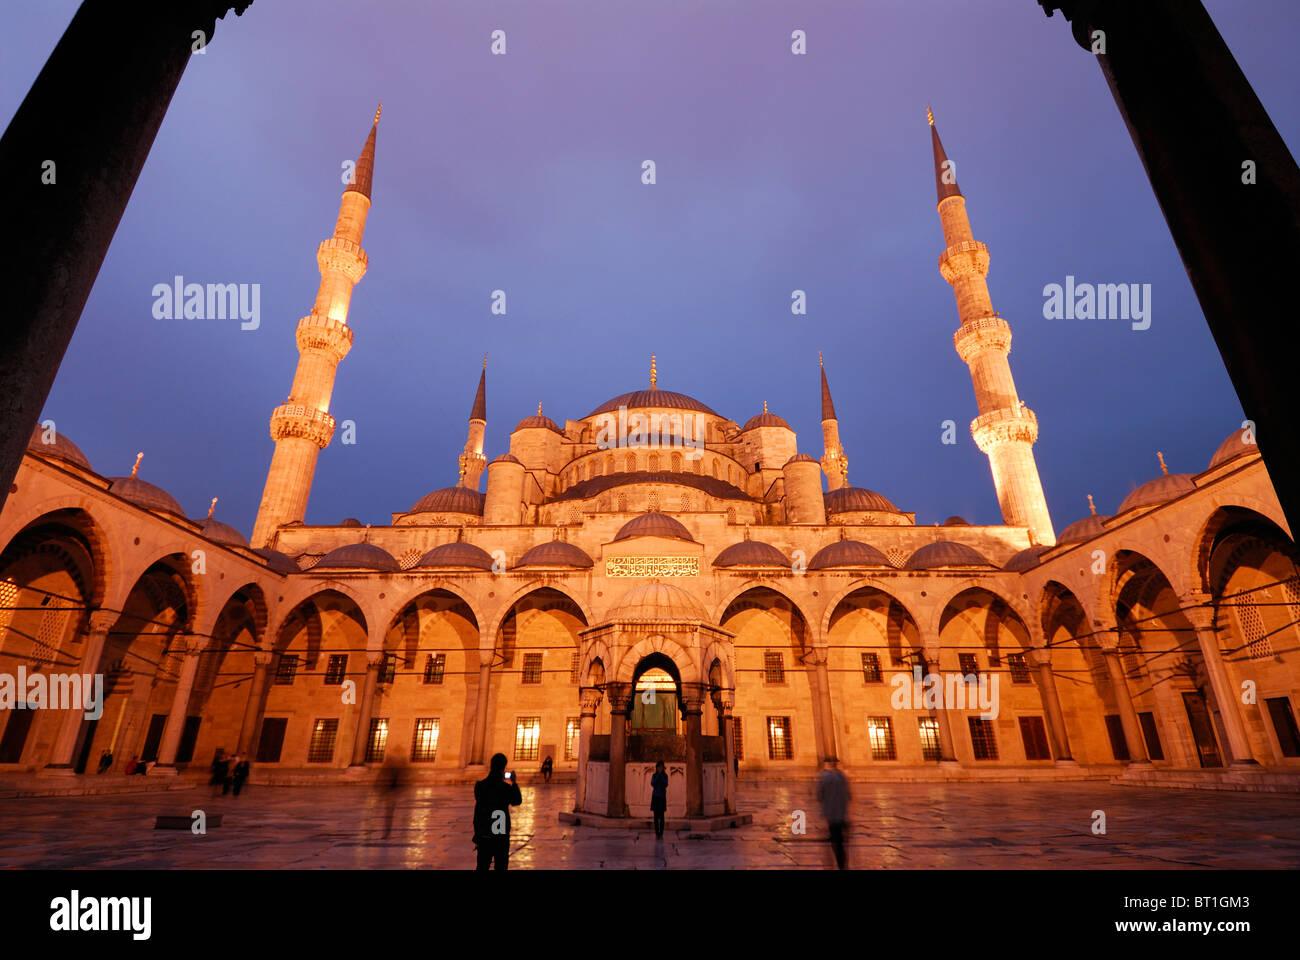 Estambul. Turquía. Mezquita Azul, Sultanahmet. Imagen De Stock